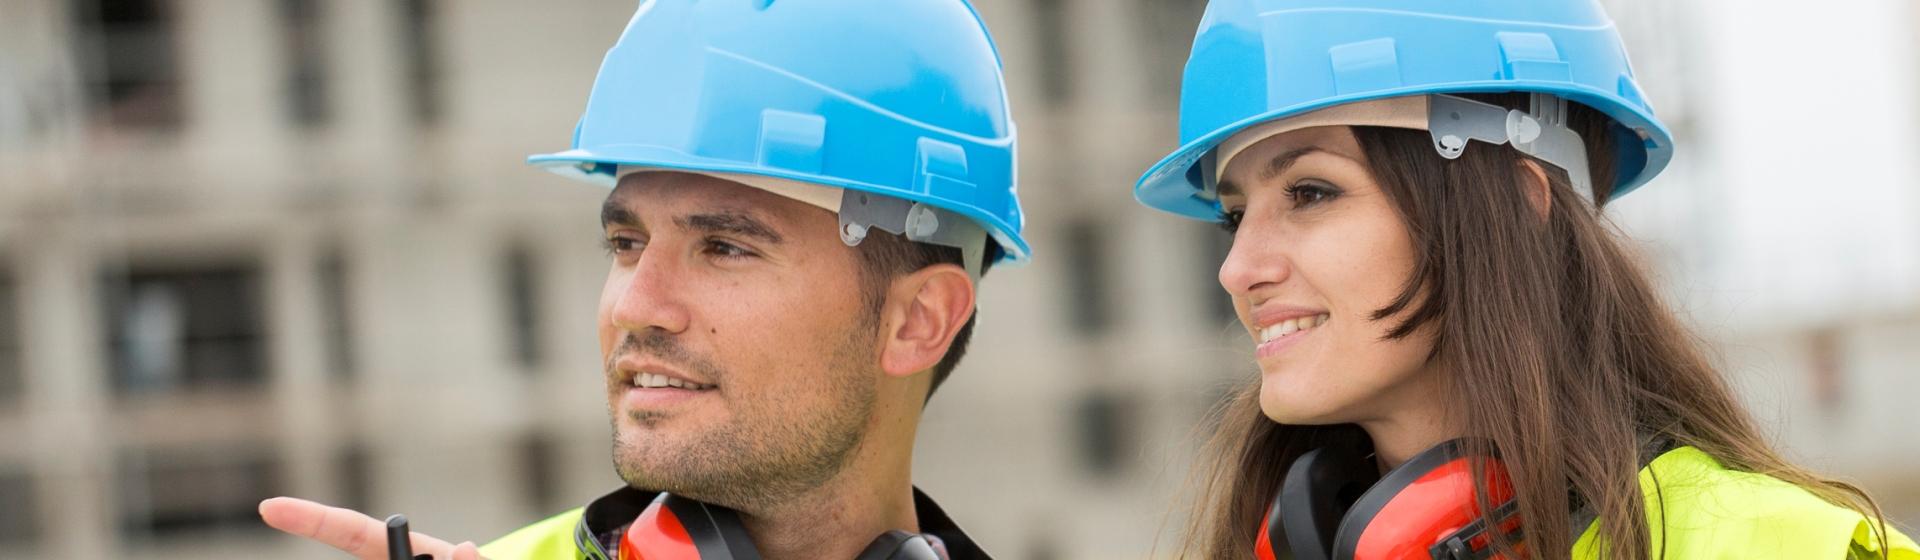 Genertal Construction Insurance